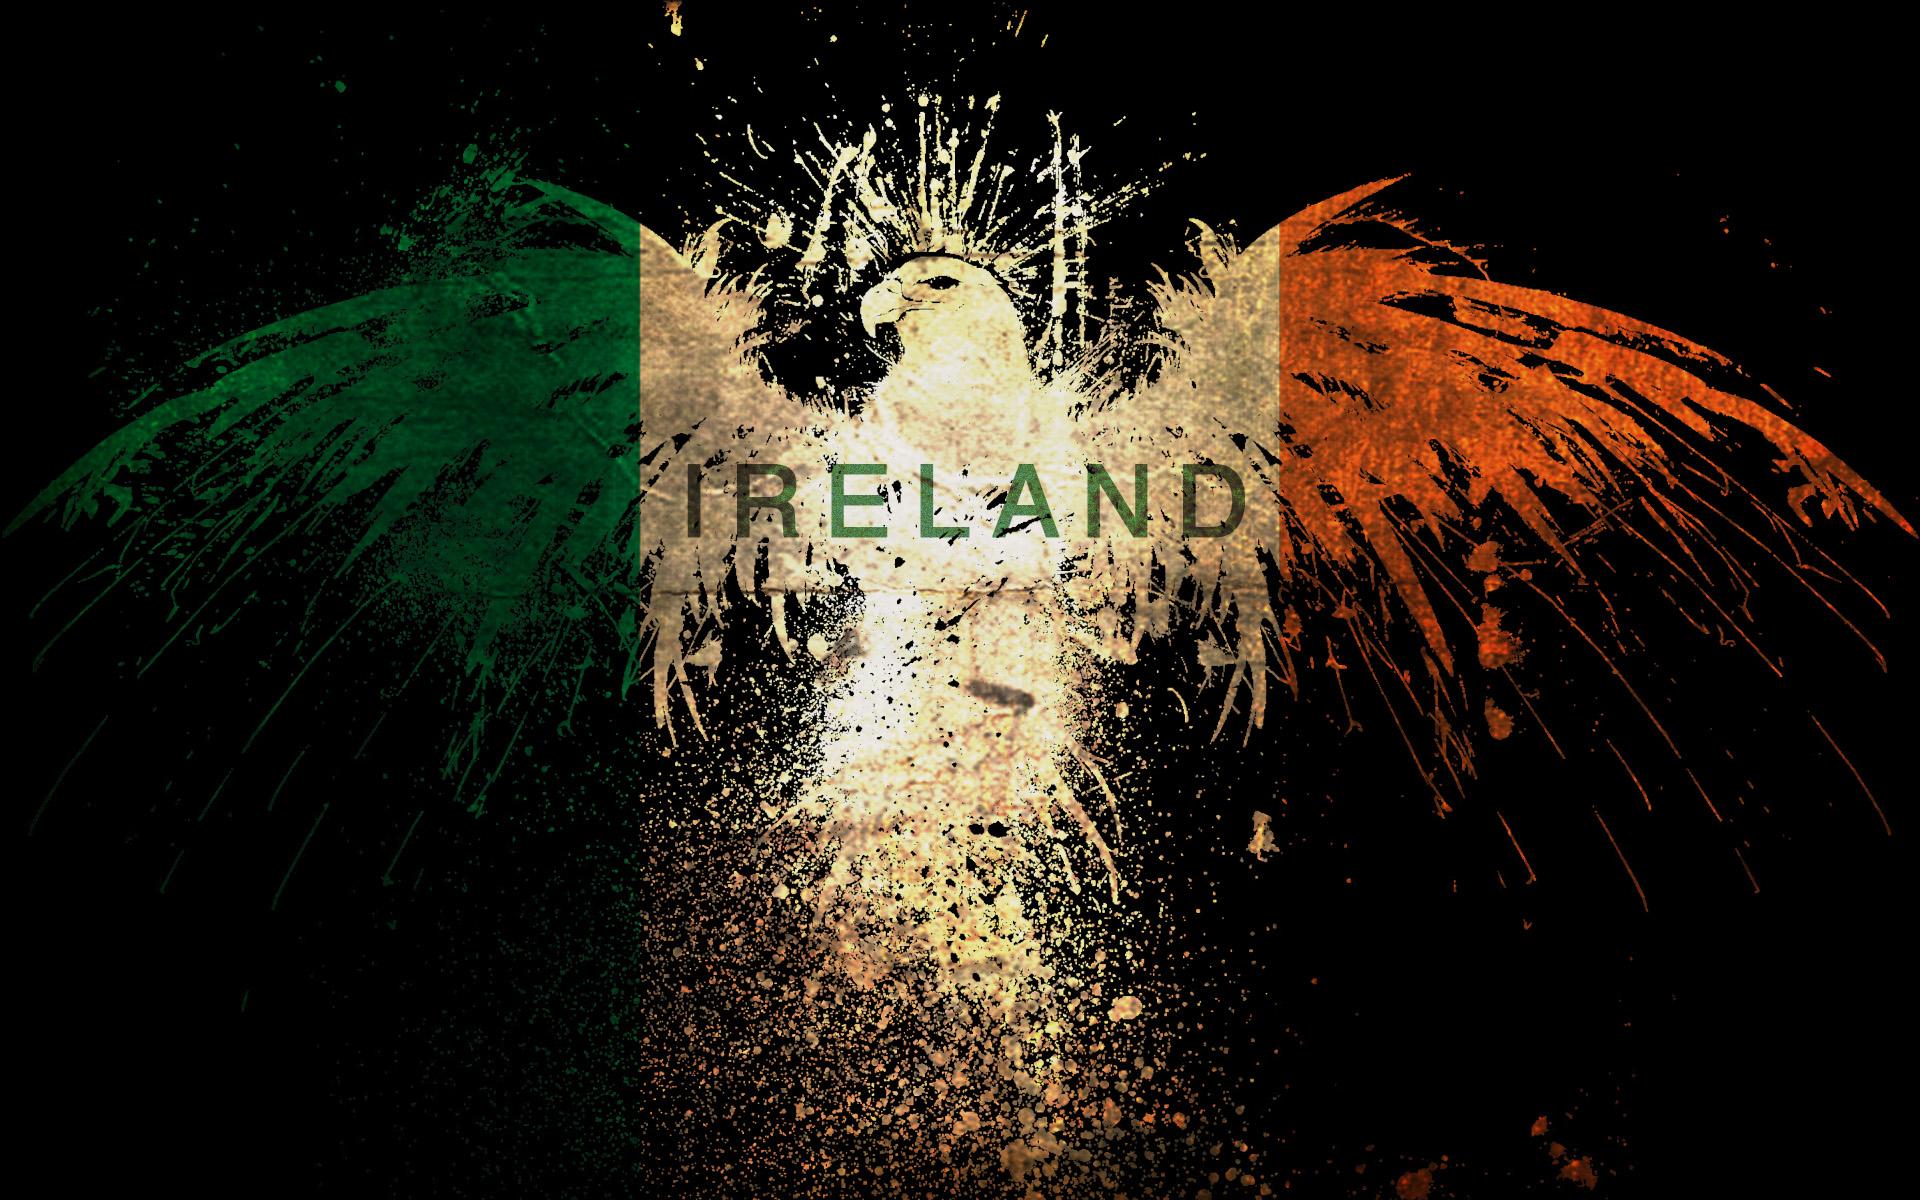 50] Irish Flag Wallpaper for iPhone on WallpaperSafari 1920x1200